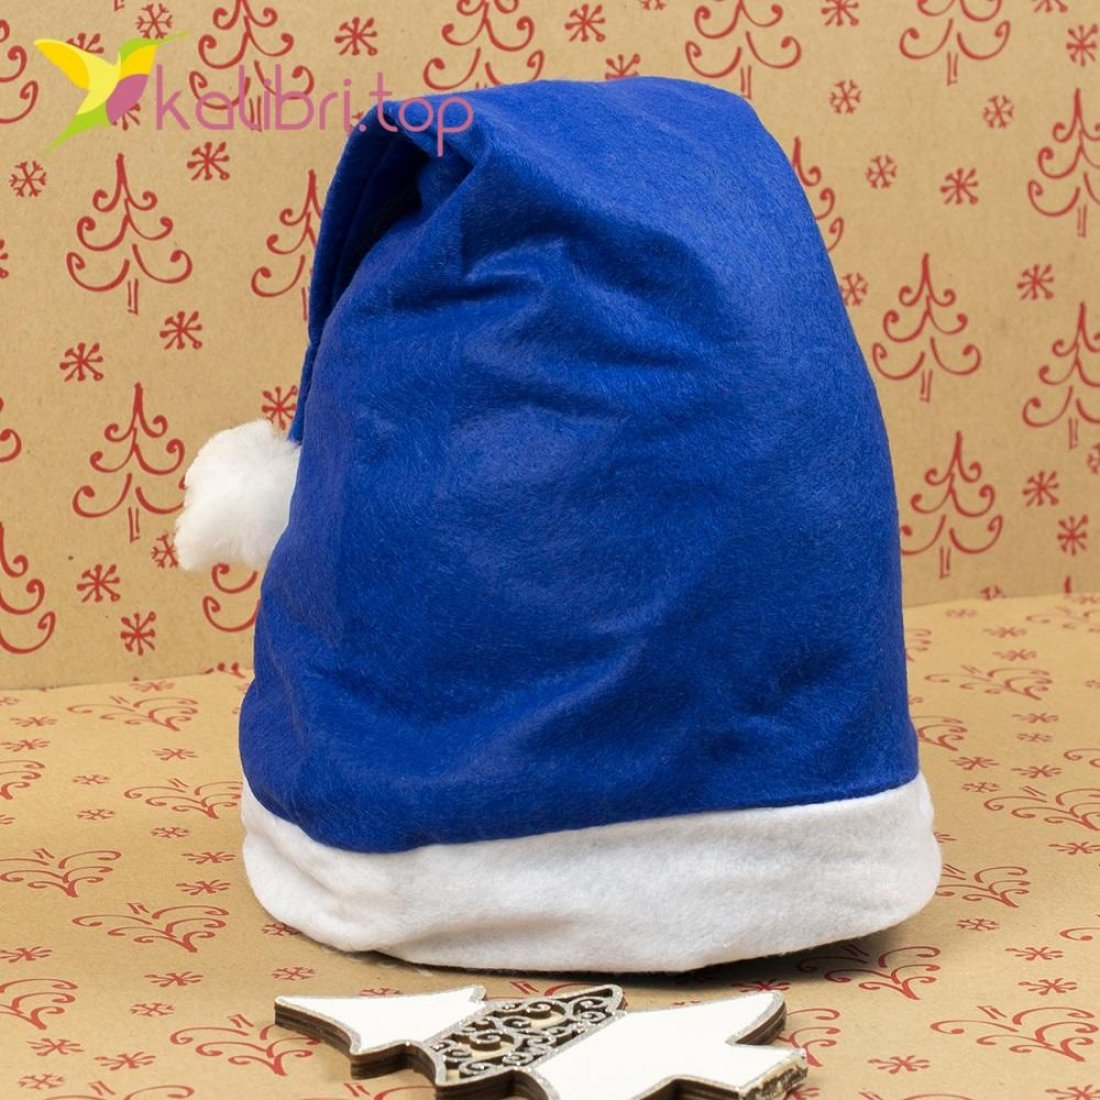 Шапка Деда Мороза синяя HQ-3499 оптом фото 5713